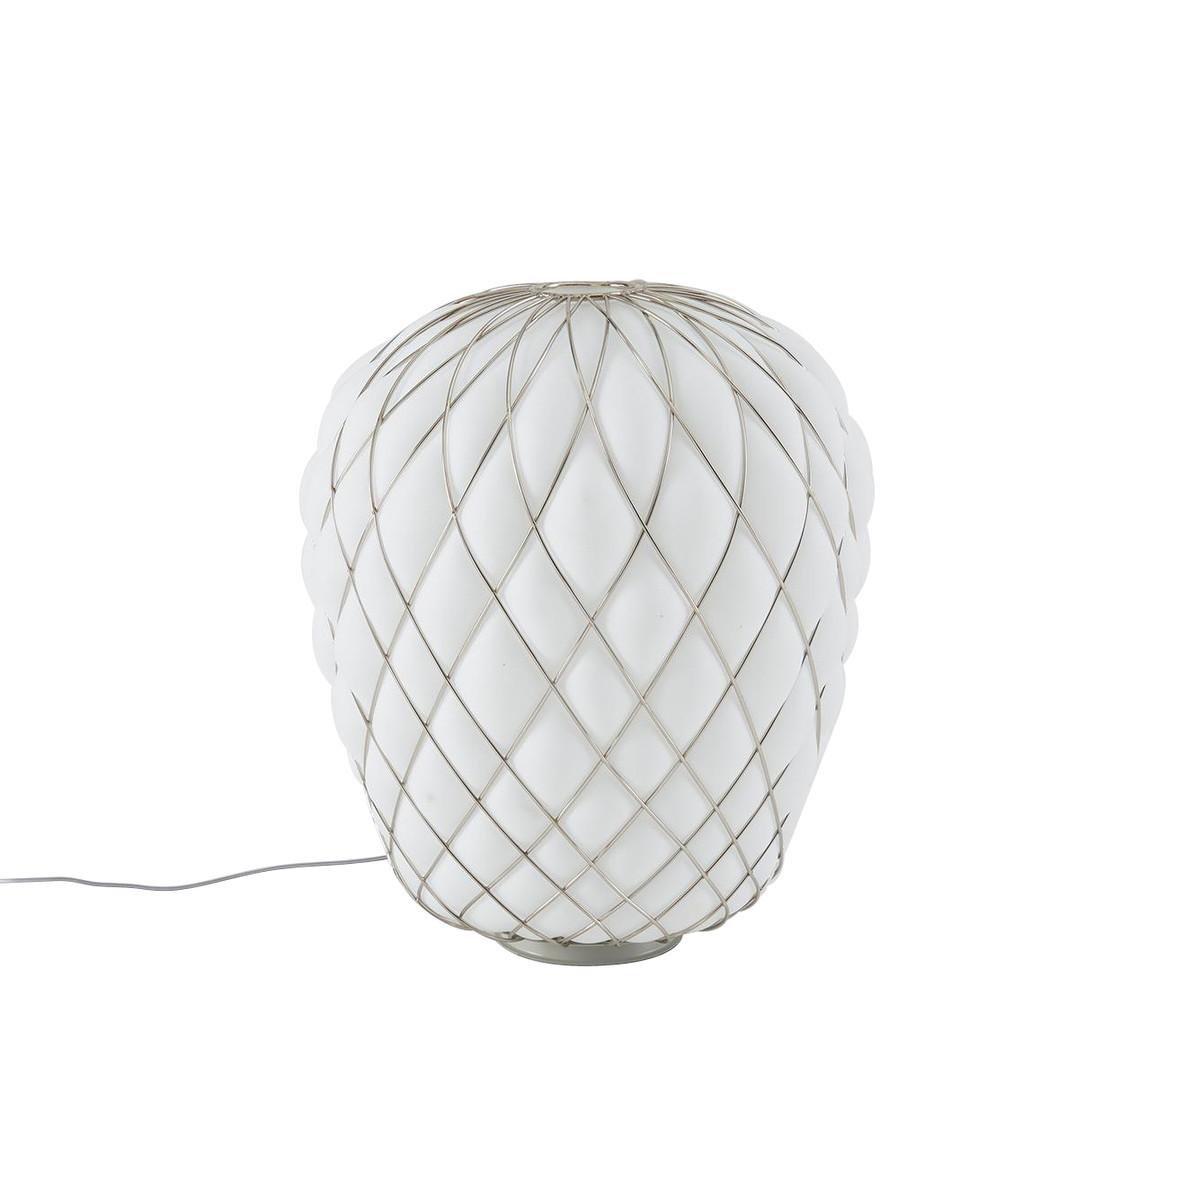 Pinecone table lamp fontana arte for Pinecone fontana